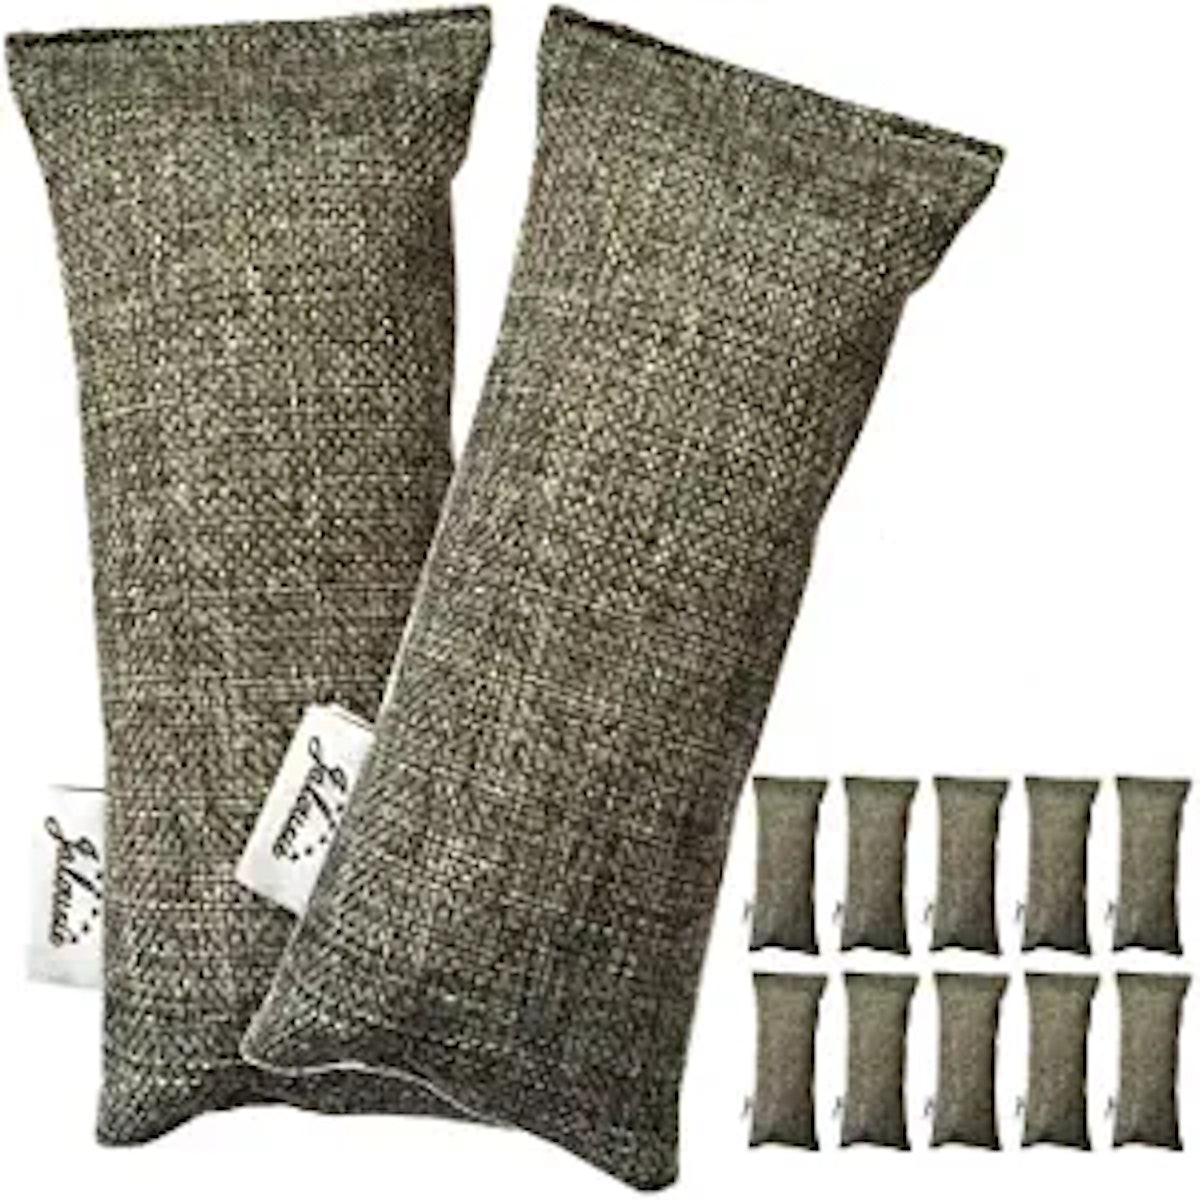 Jalousie Each Mini Bamboo Charcoal Bags (12-Pack)